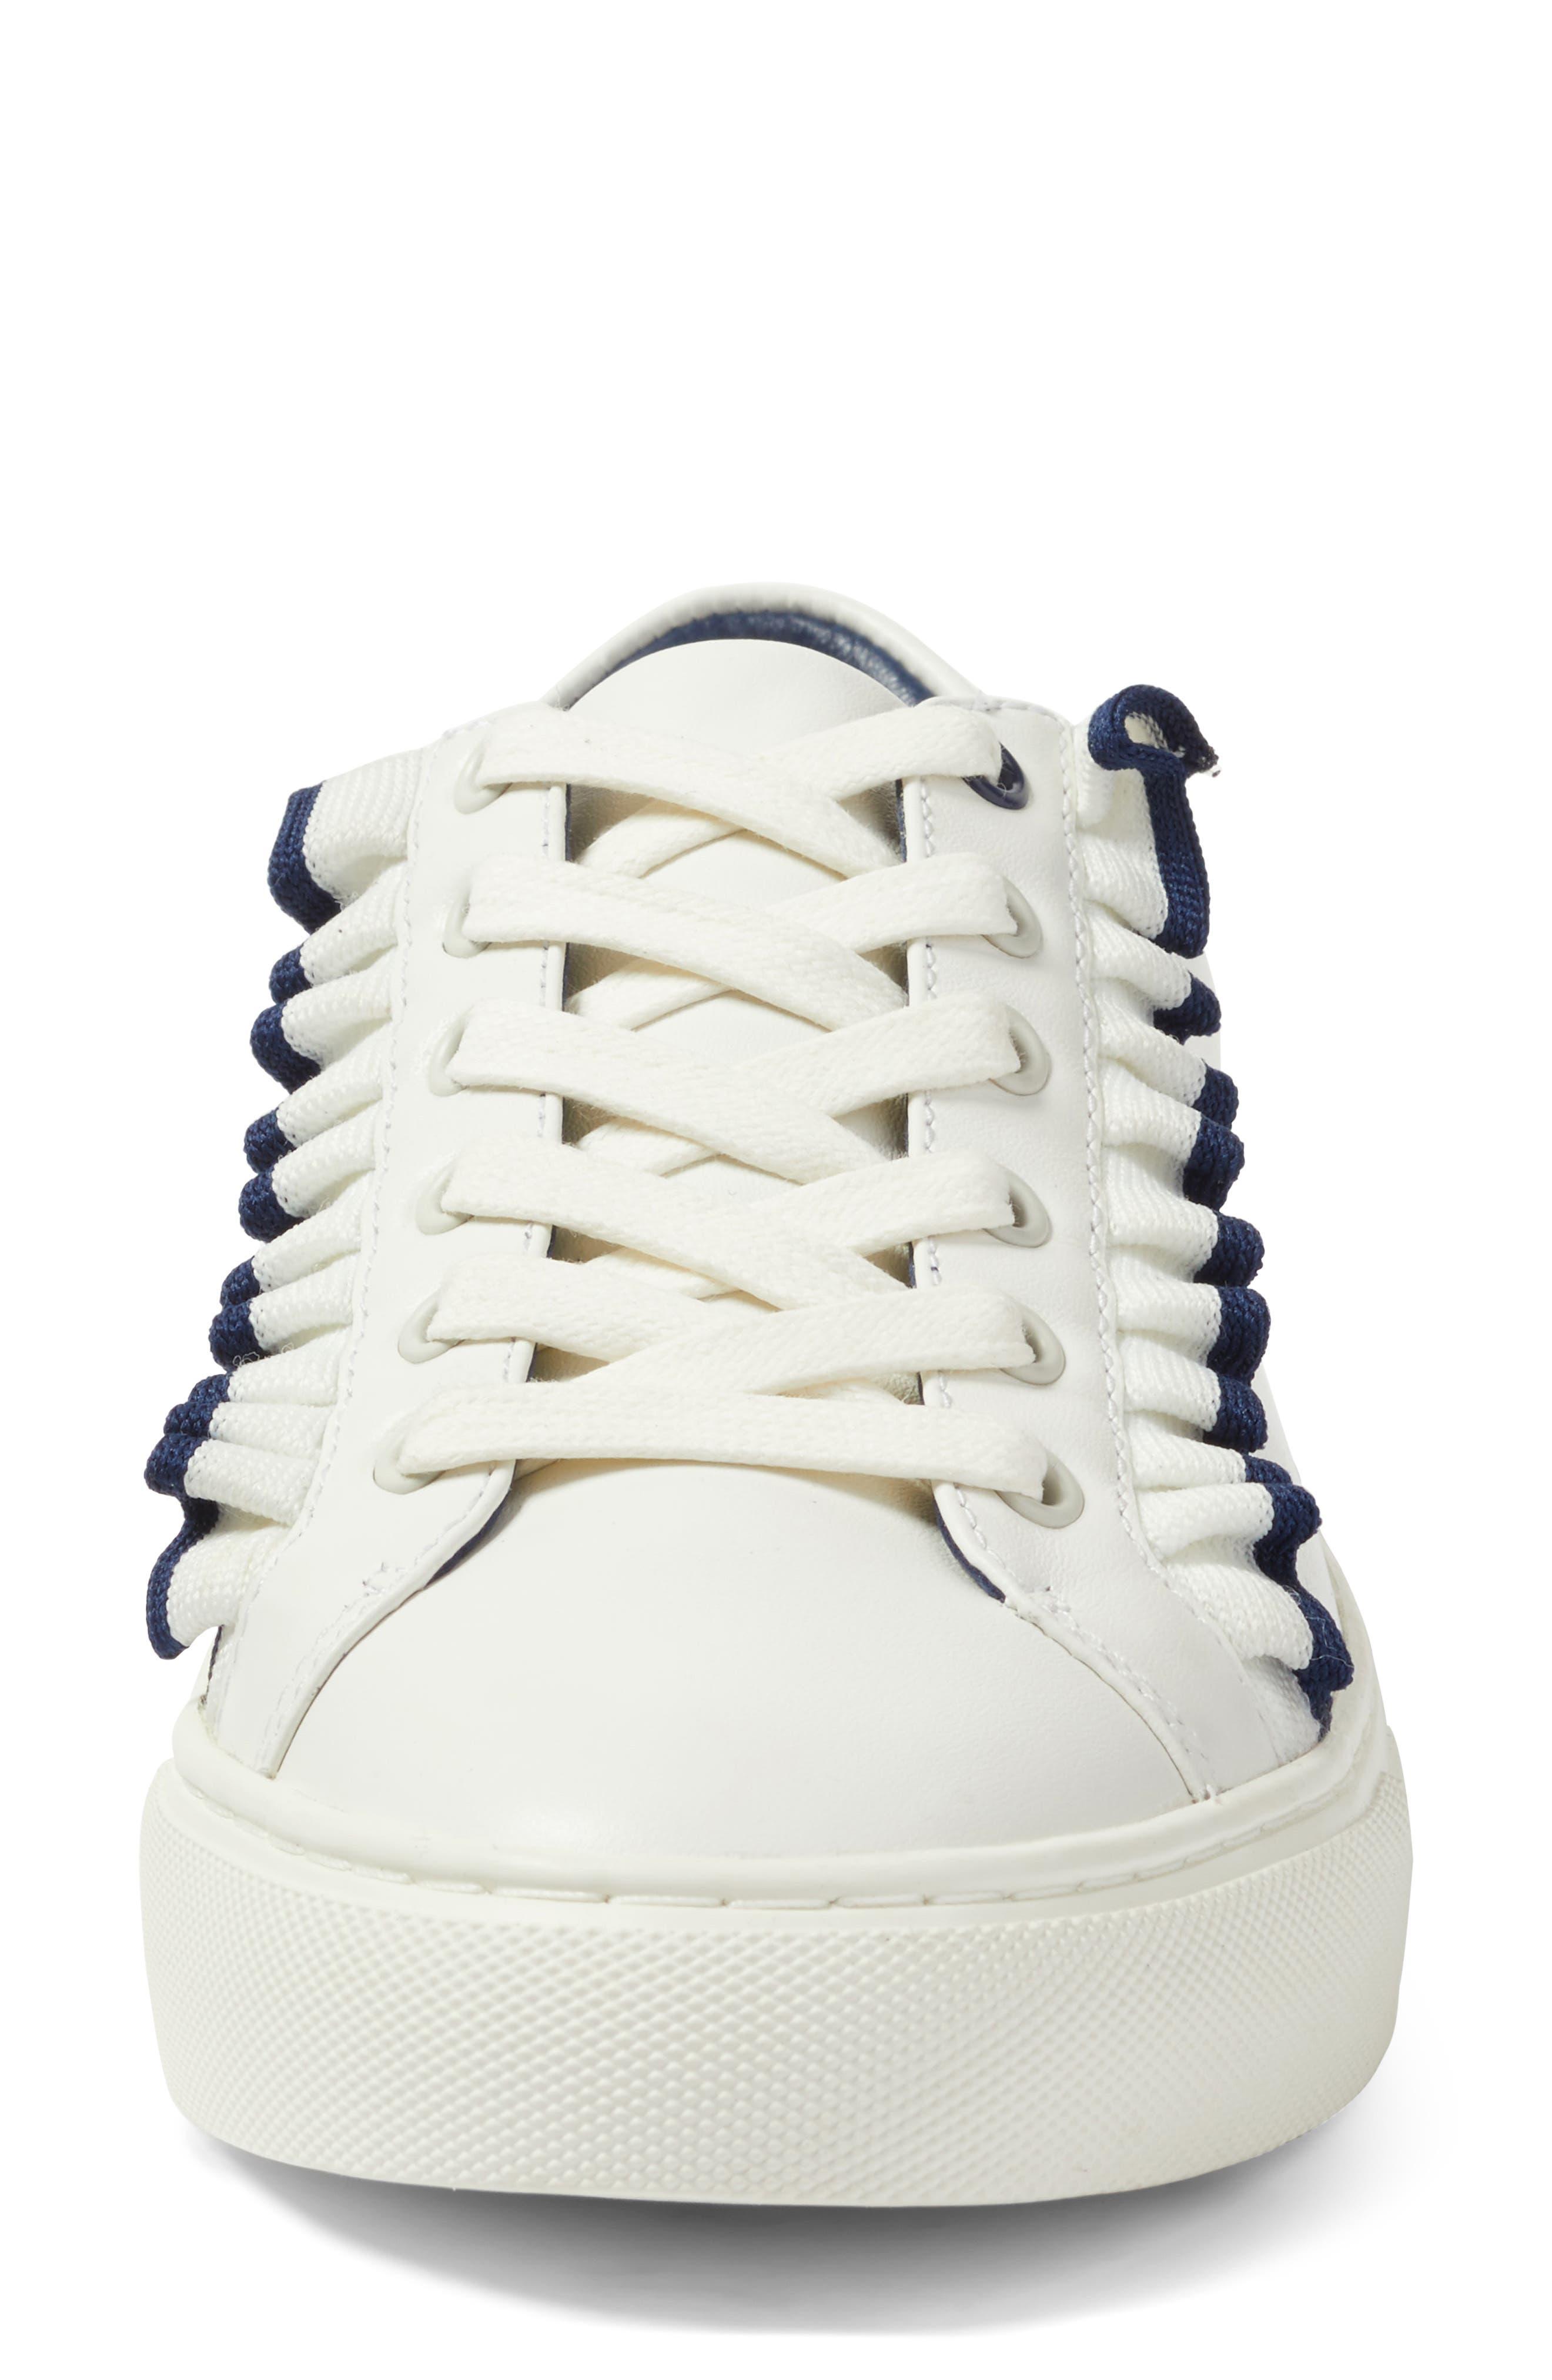 Ruffle Sneaker,                             Alternate thumbnail 4, color,                             Snow White/ Navy Sea